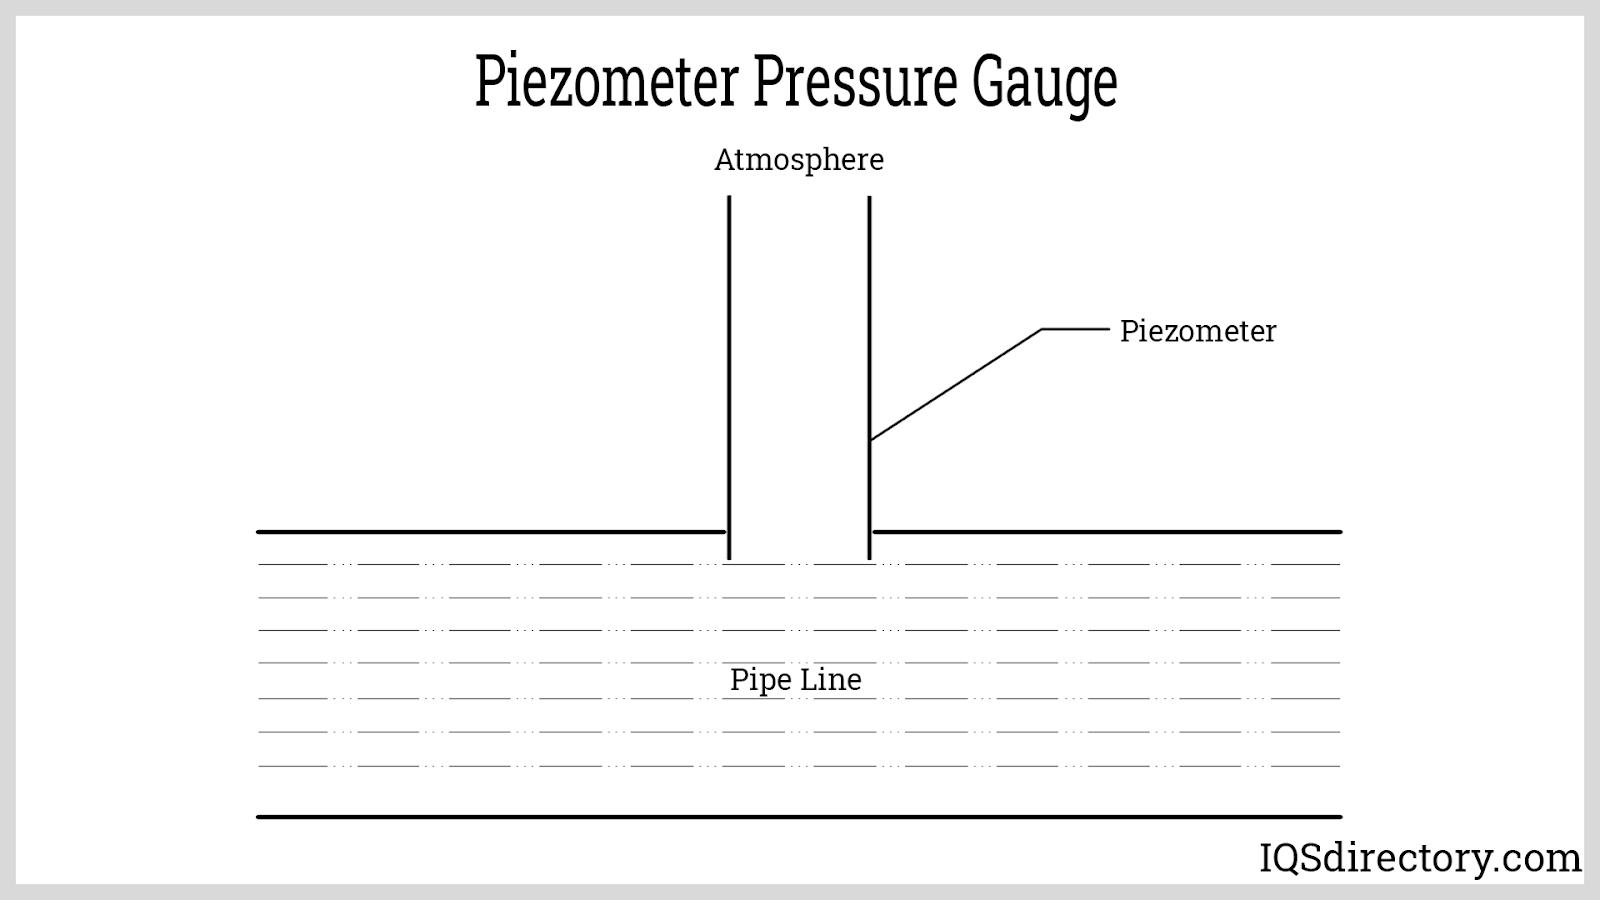 Piezometer Pressure Gauge